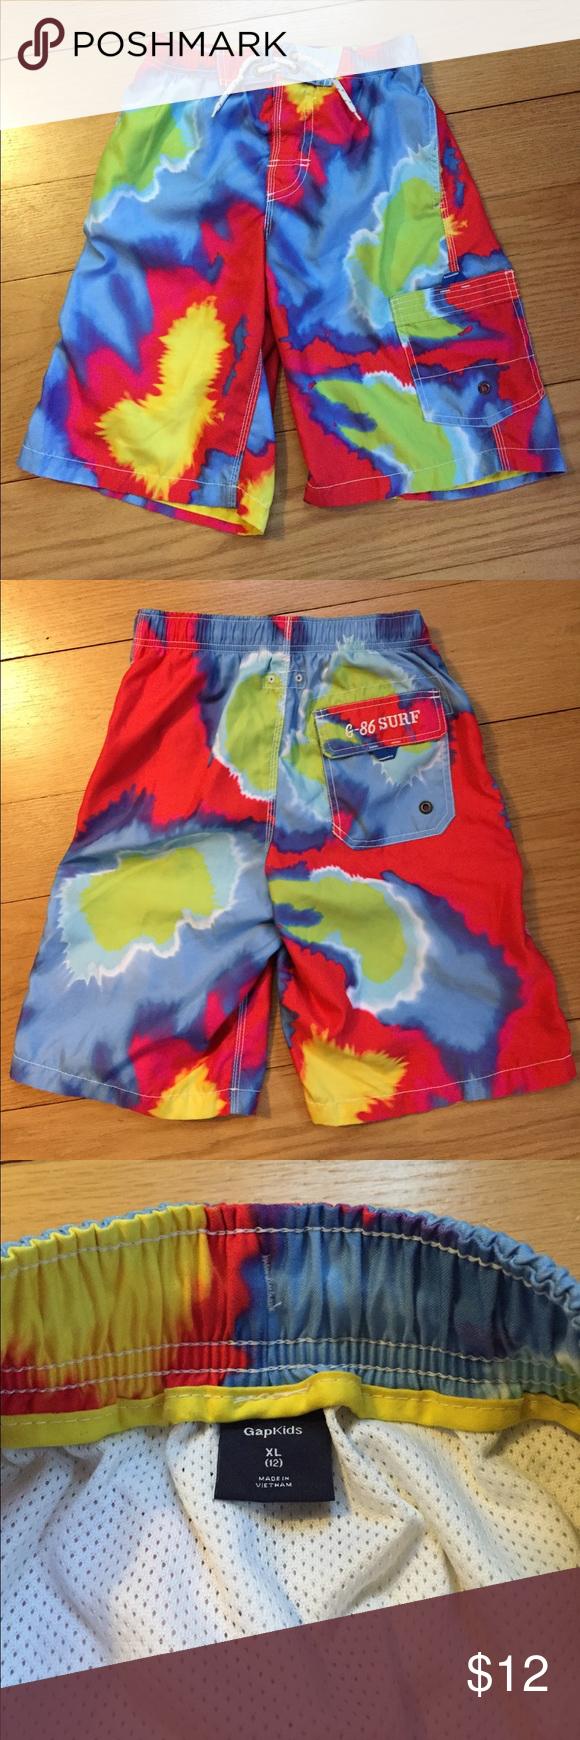 16713202c9 GapKids swim shorts size 12 Gap Kids tyedye swim shorts with inside lining.  In great condition!! Size XL/12 with drawstring inside to adjust size of  waist. ...